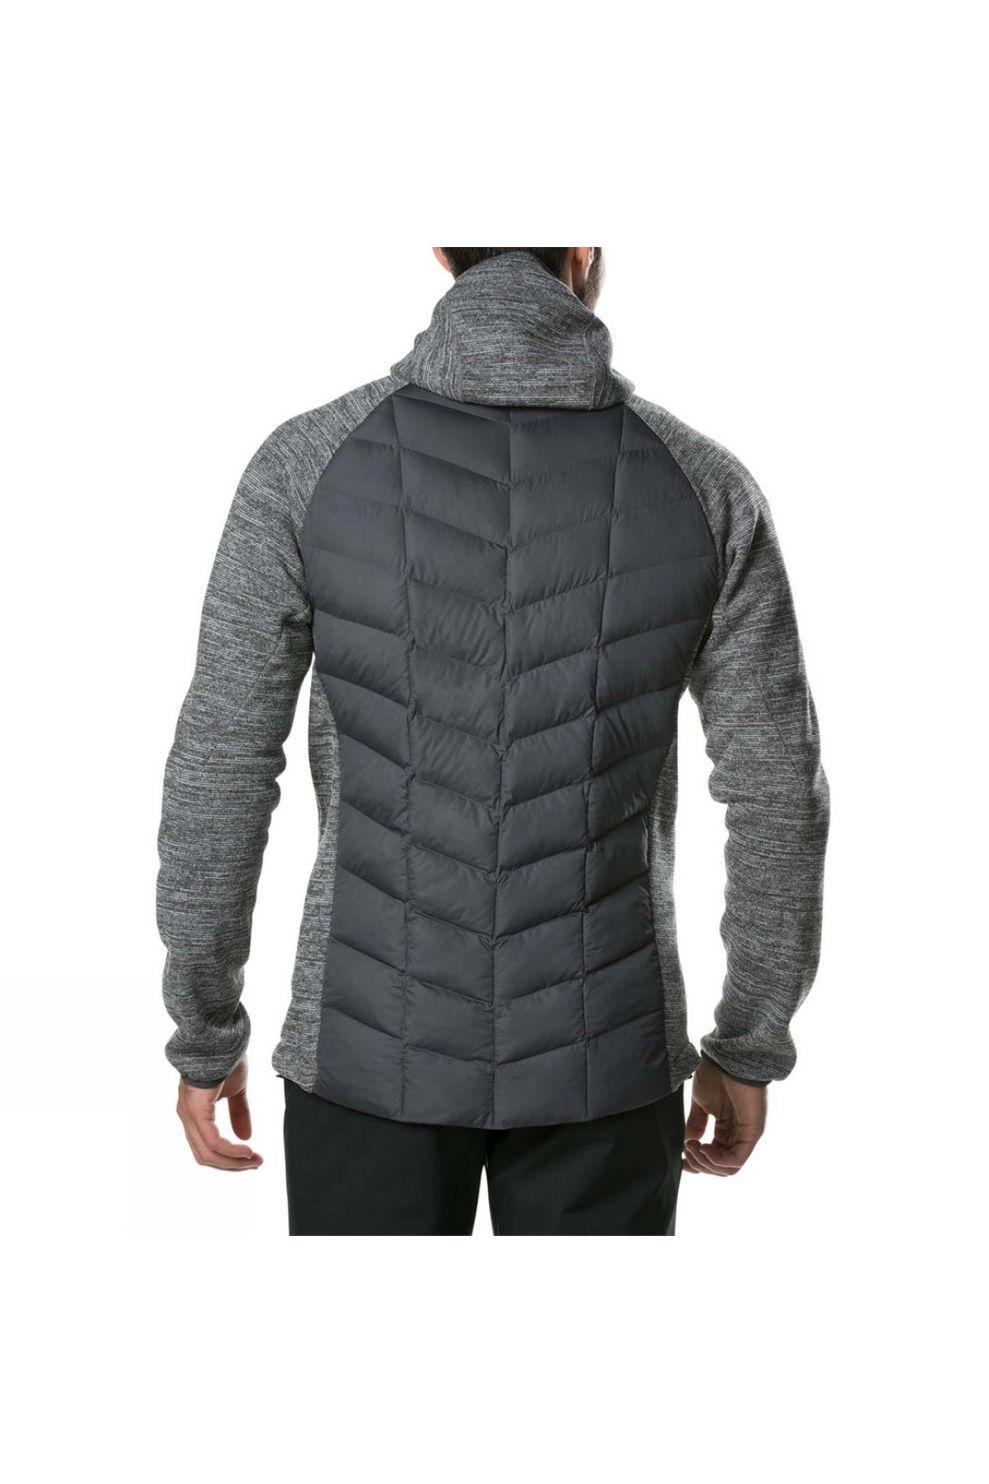 Berghaus Mens Duneline Hybrid Insulated Jacket